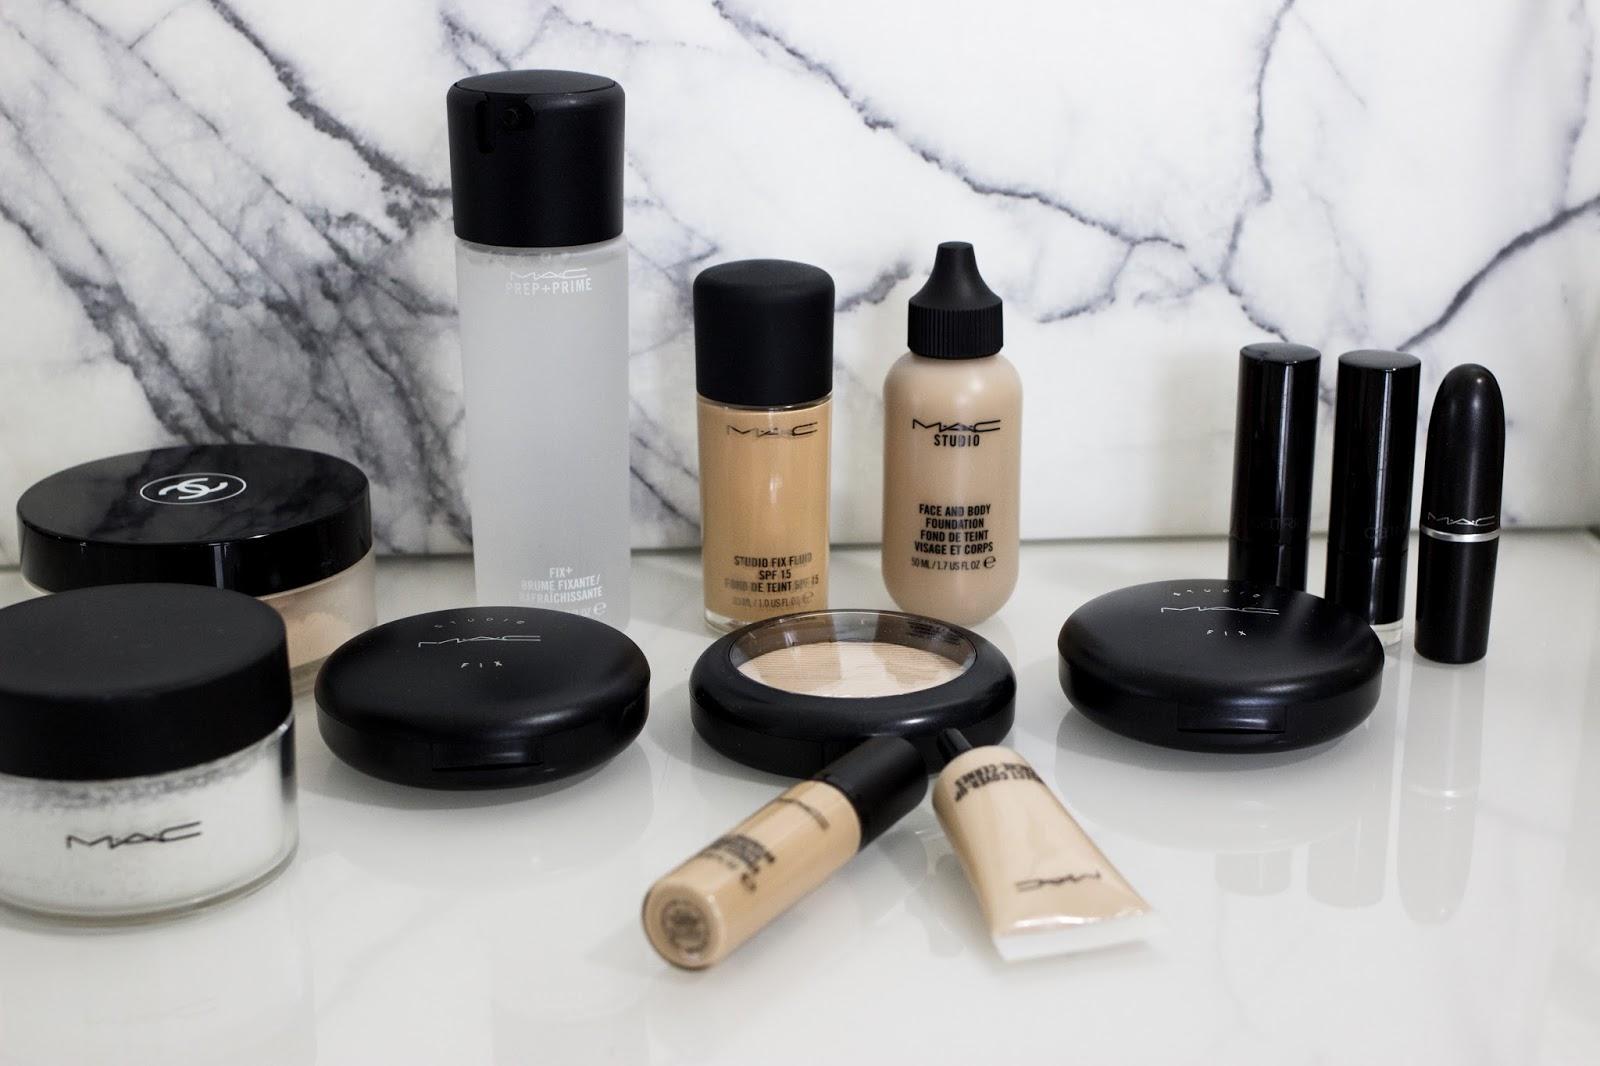 Mac cosmetics, Make Up